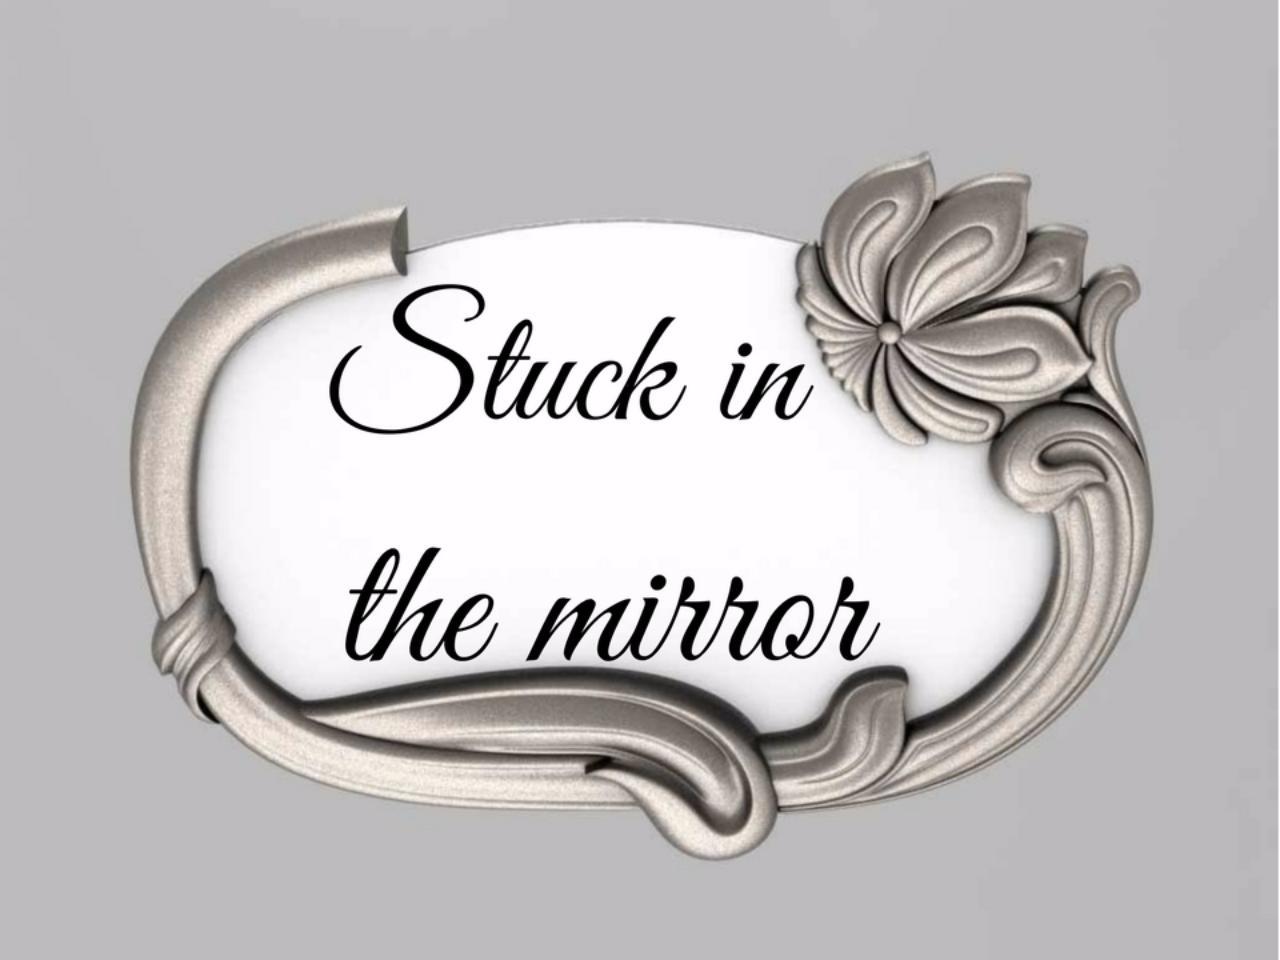 Stuck in the mirror stuckinthemirror stories